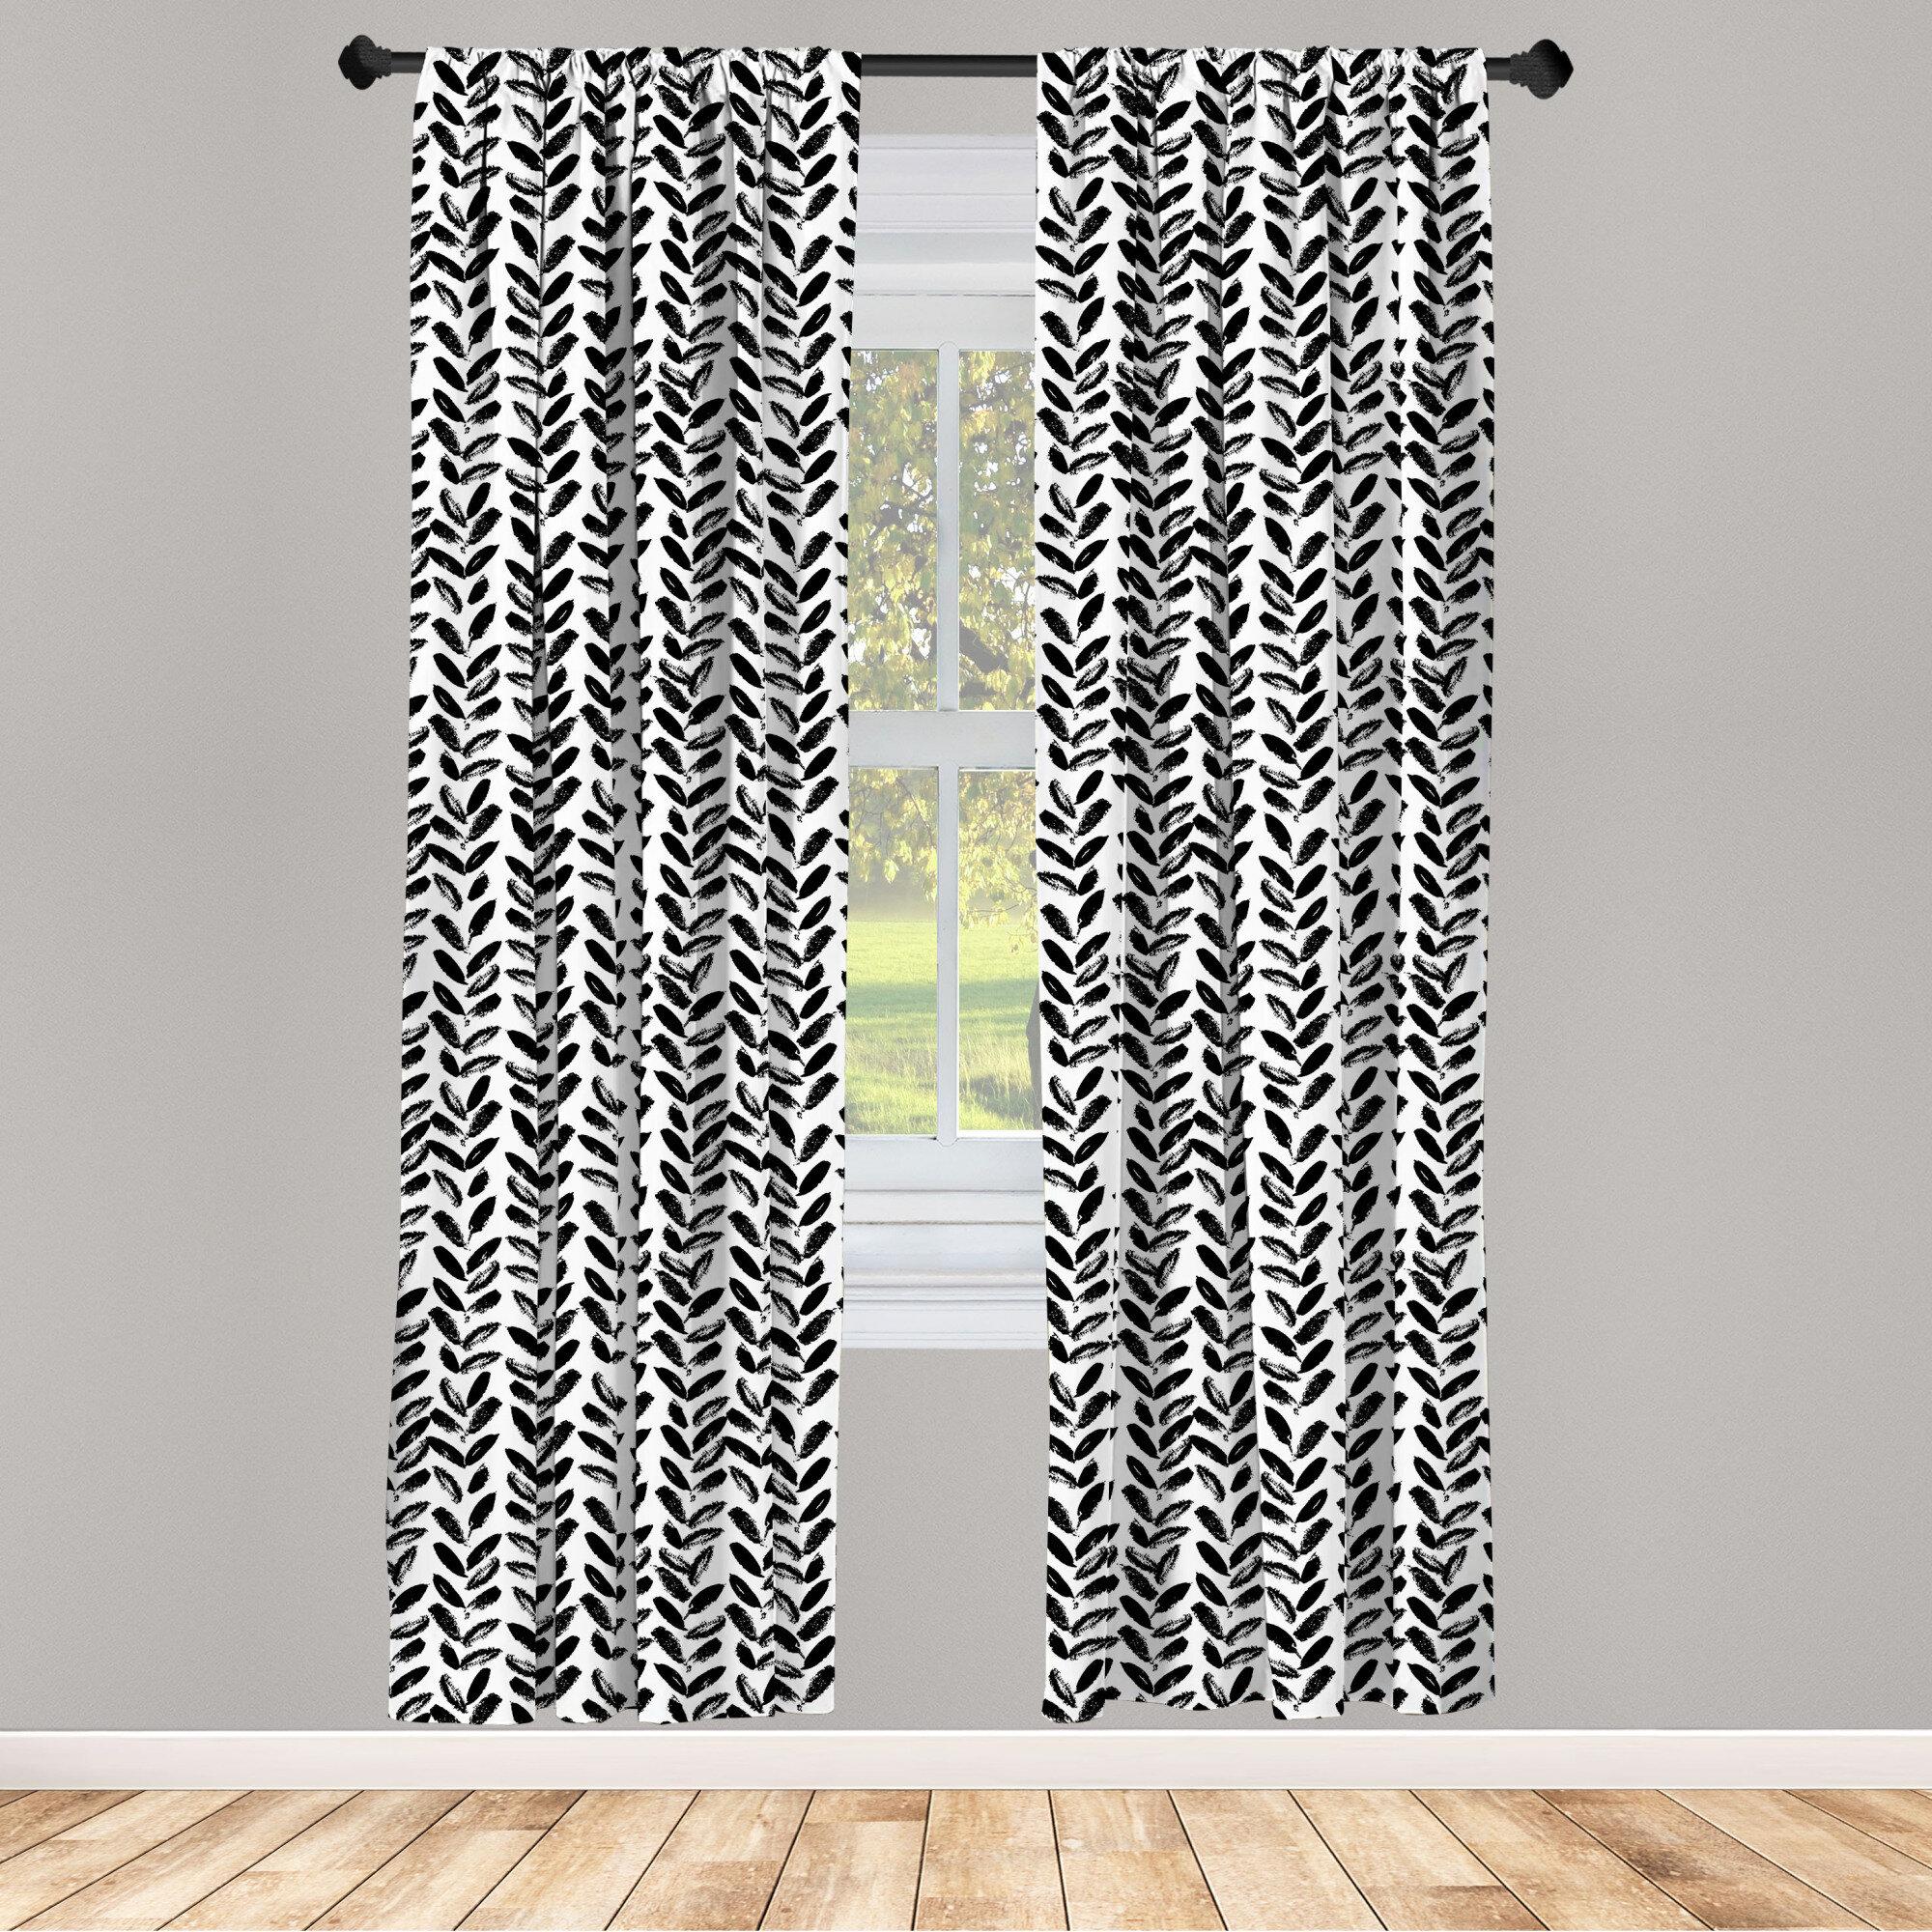 East Urban Home Room Darkening Rod Pocket Curtain Panels Reviews Wayfair